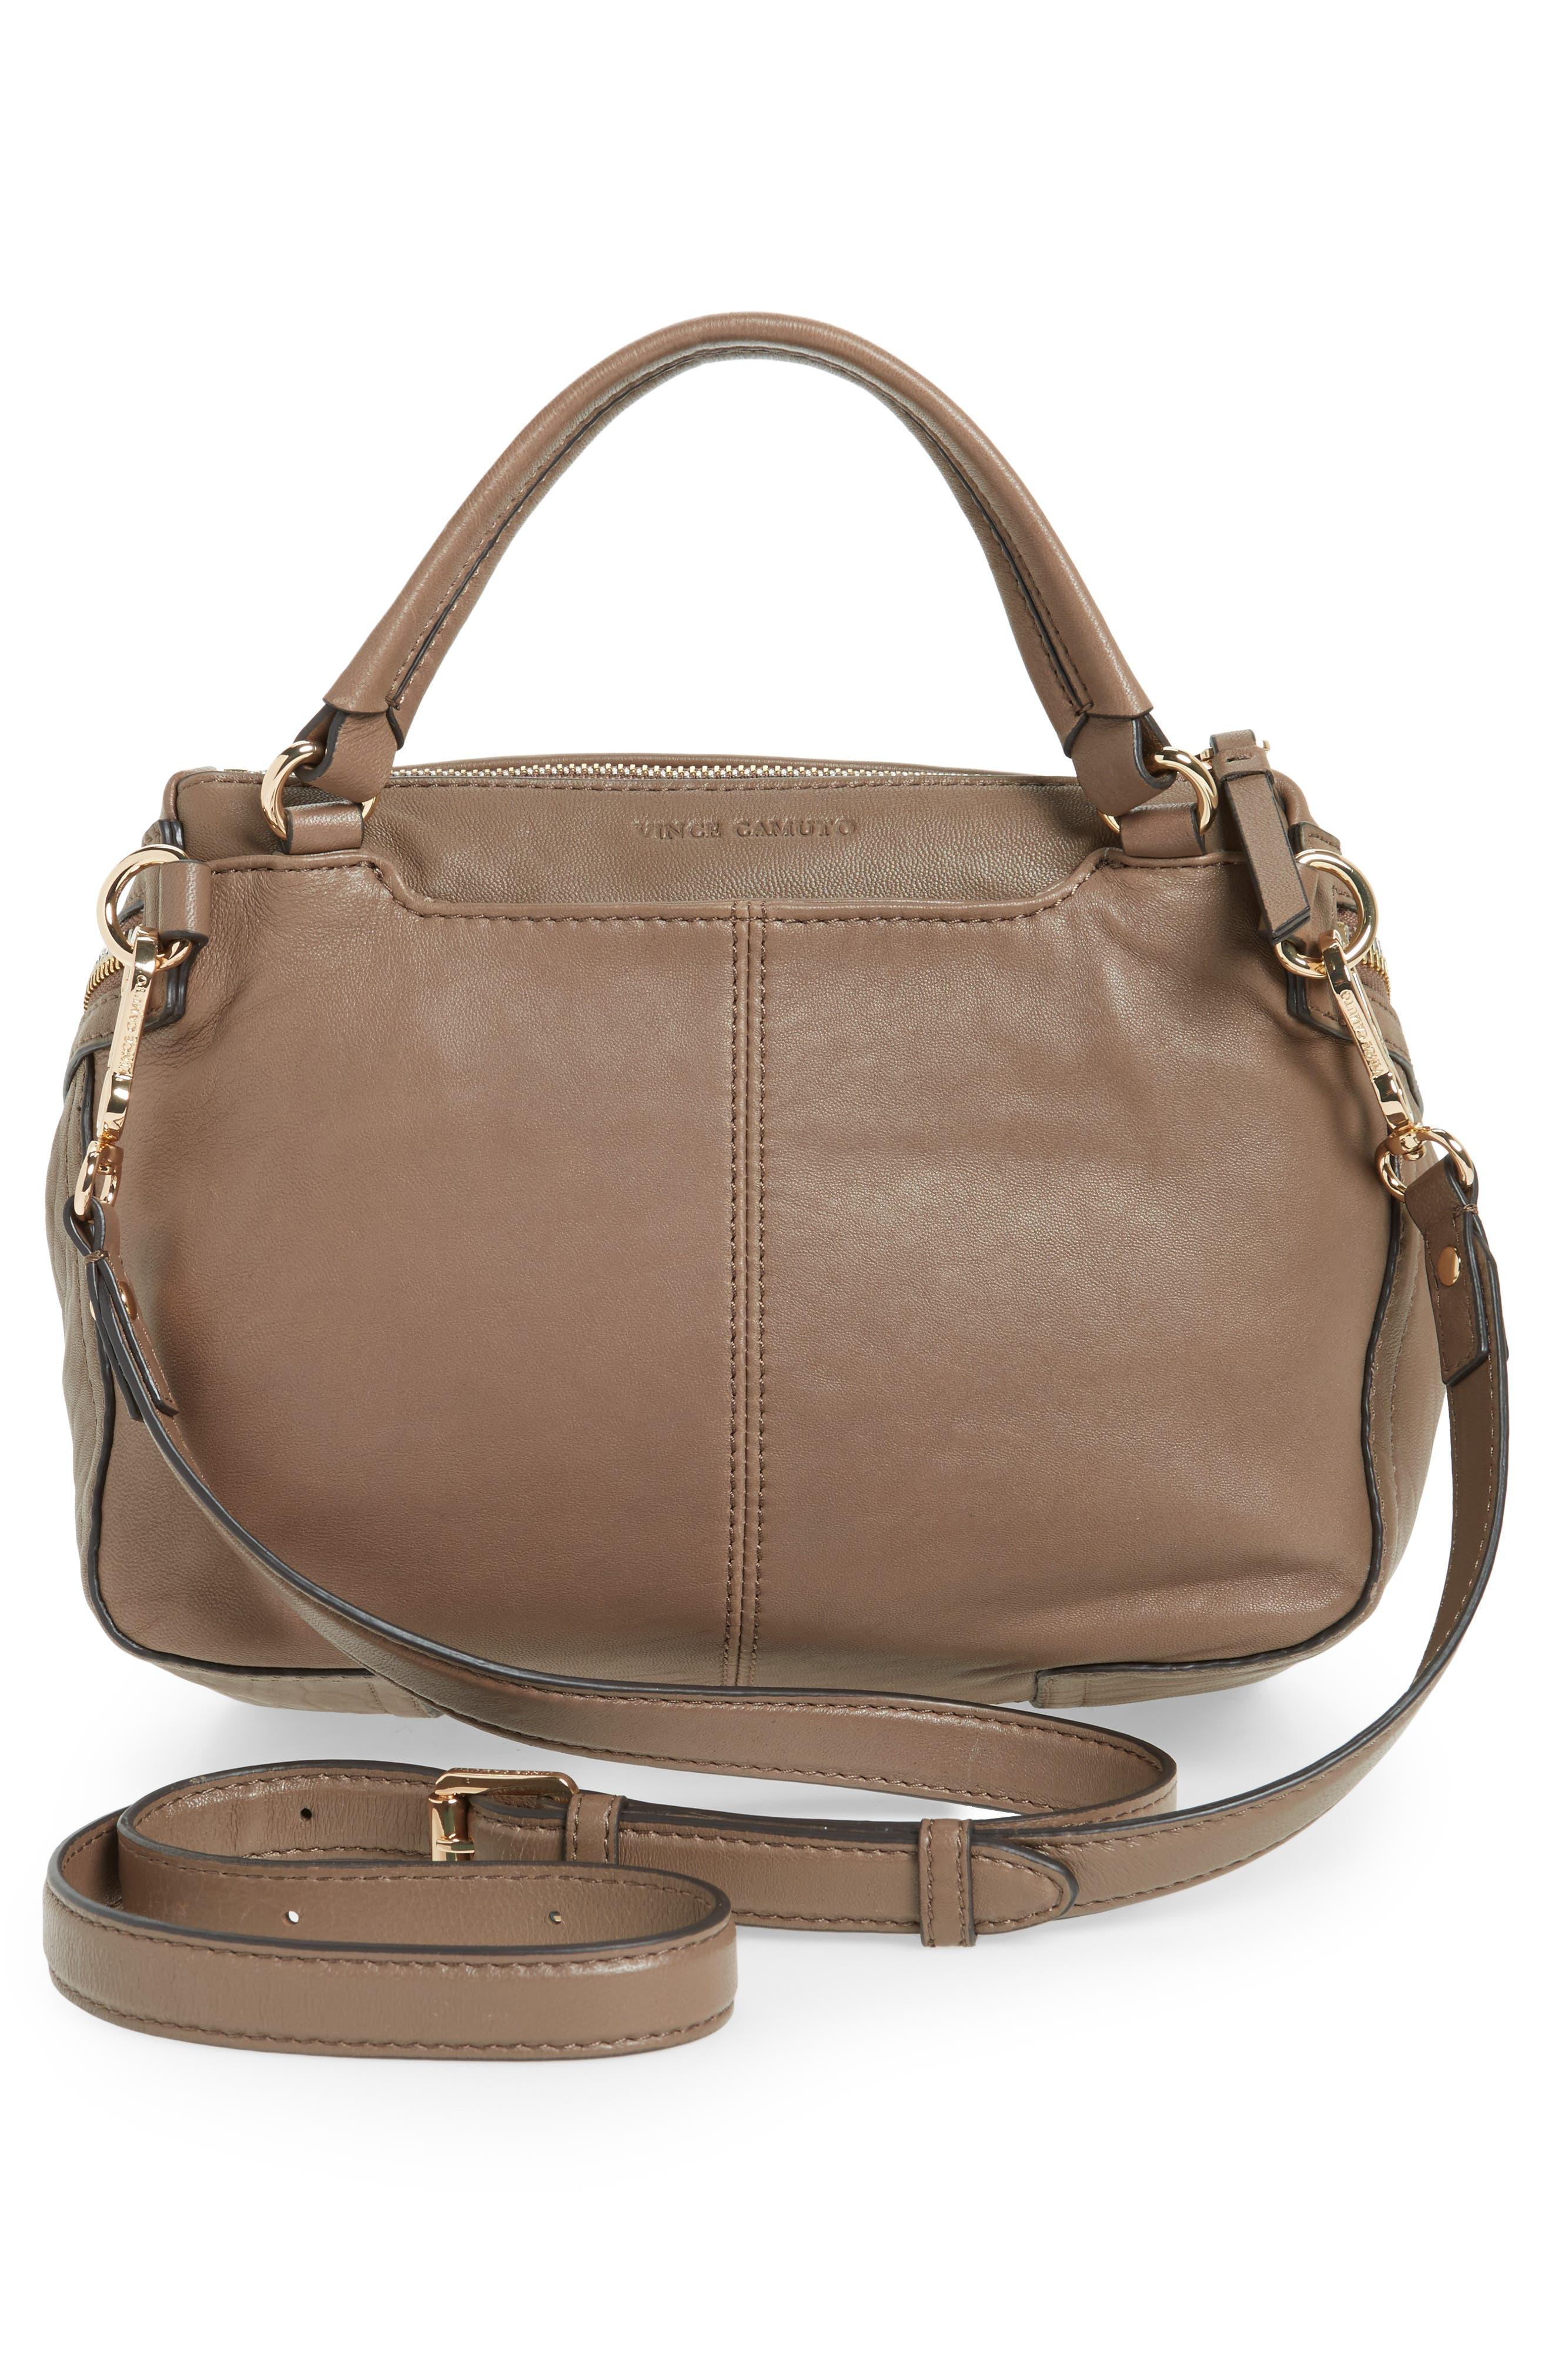 Medium Patch Leather Crossbody Bag,                             Alternate thumbnail 6, color,